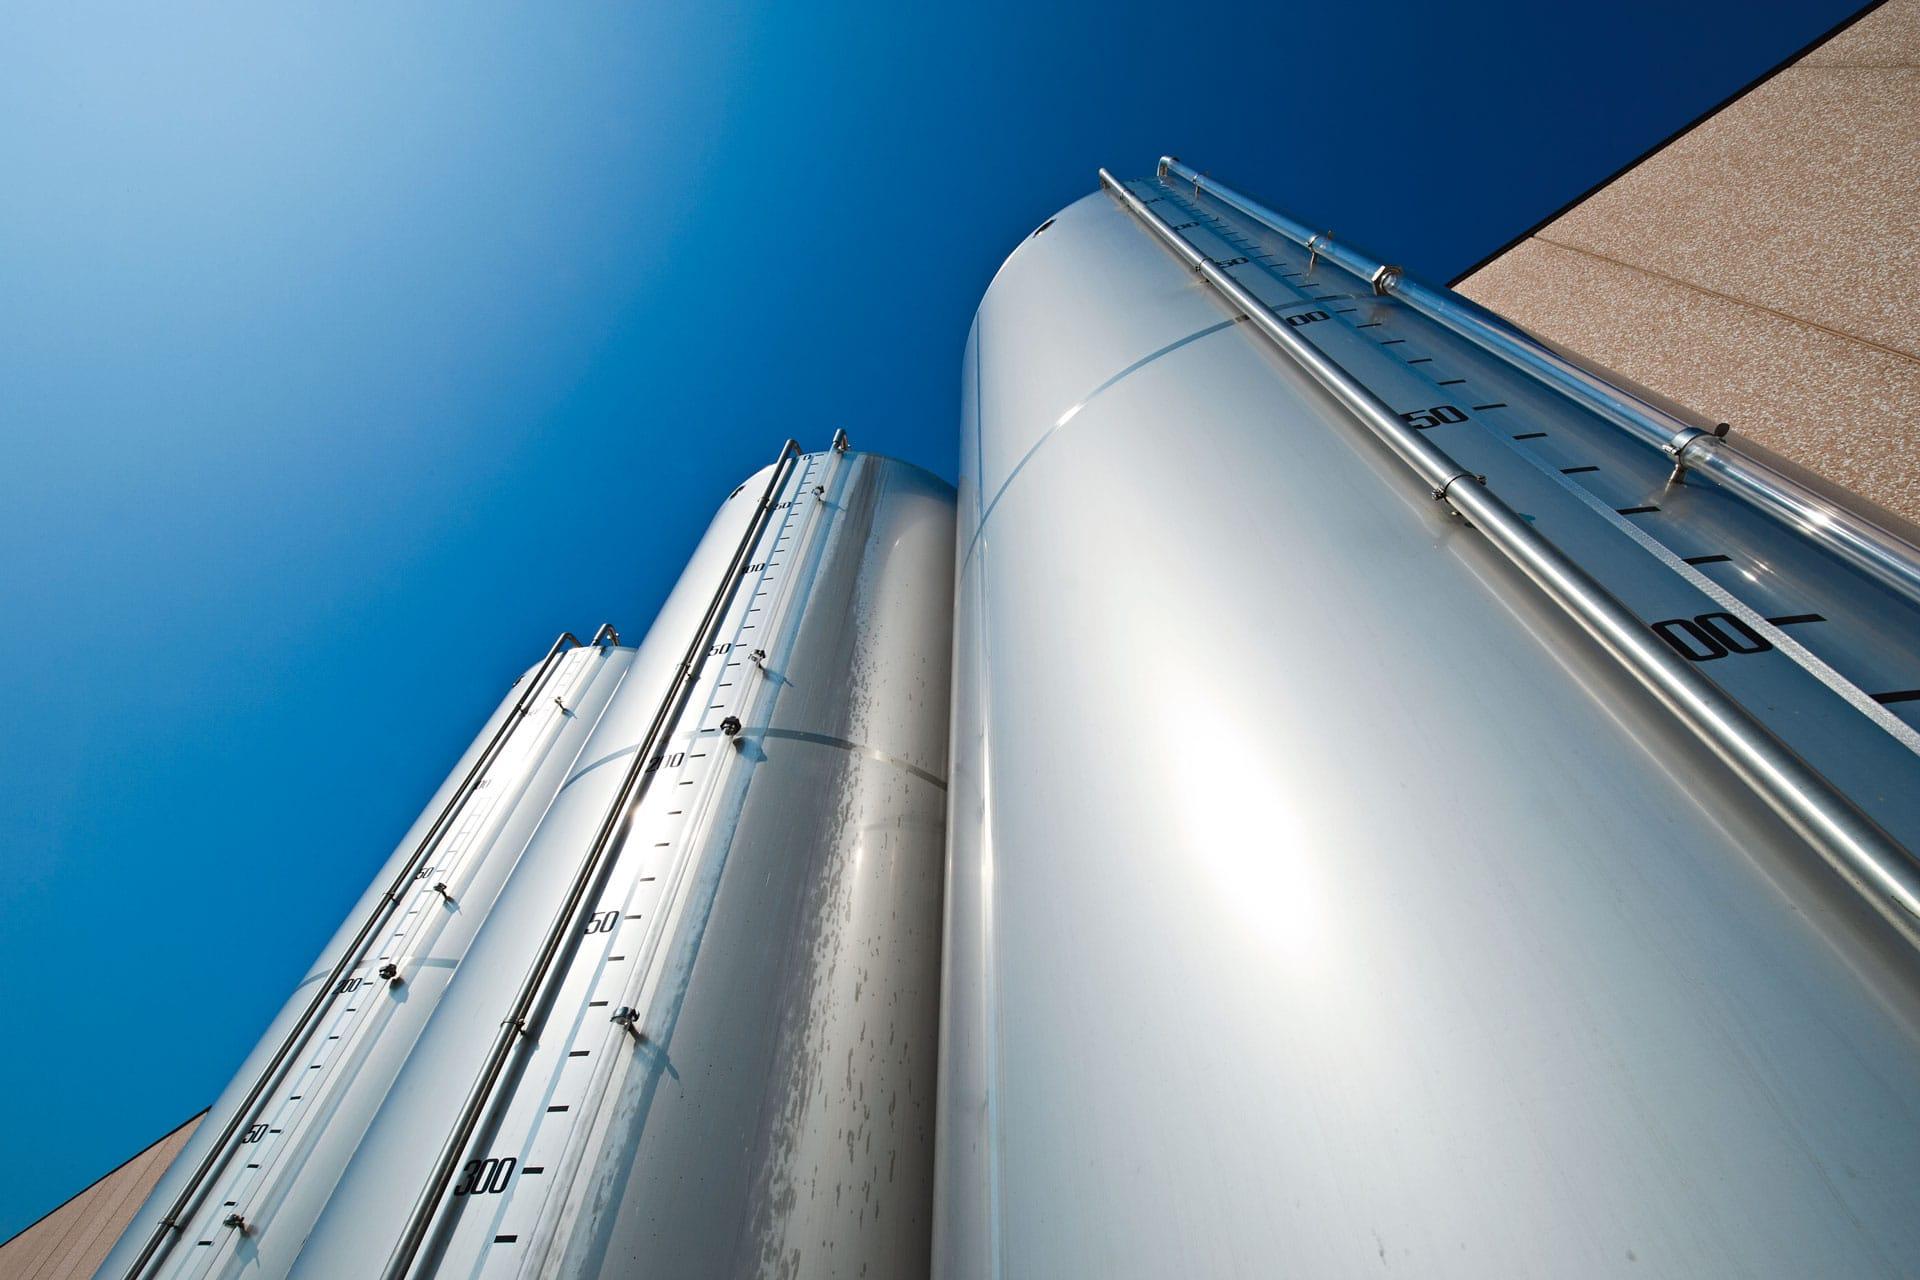 Olfood silos